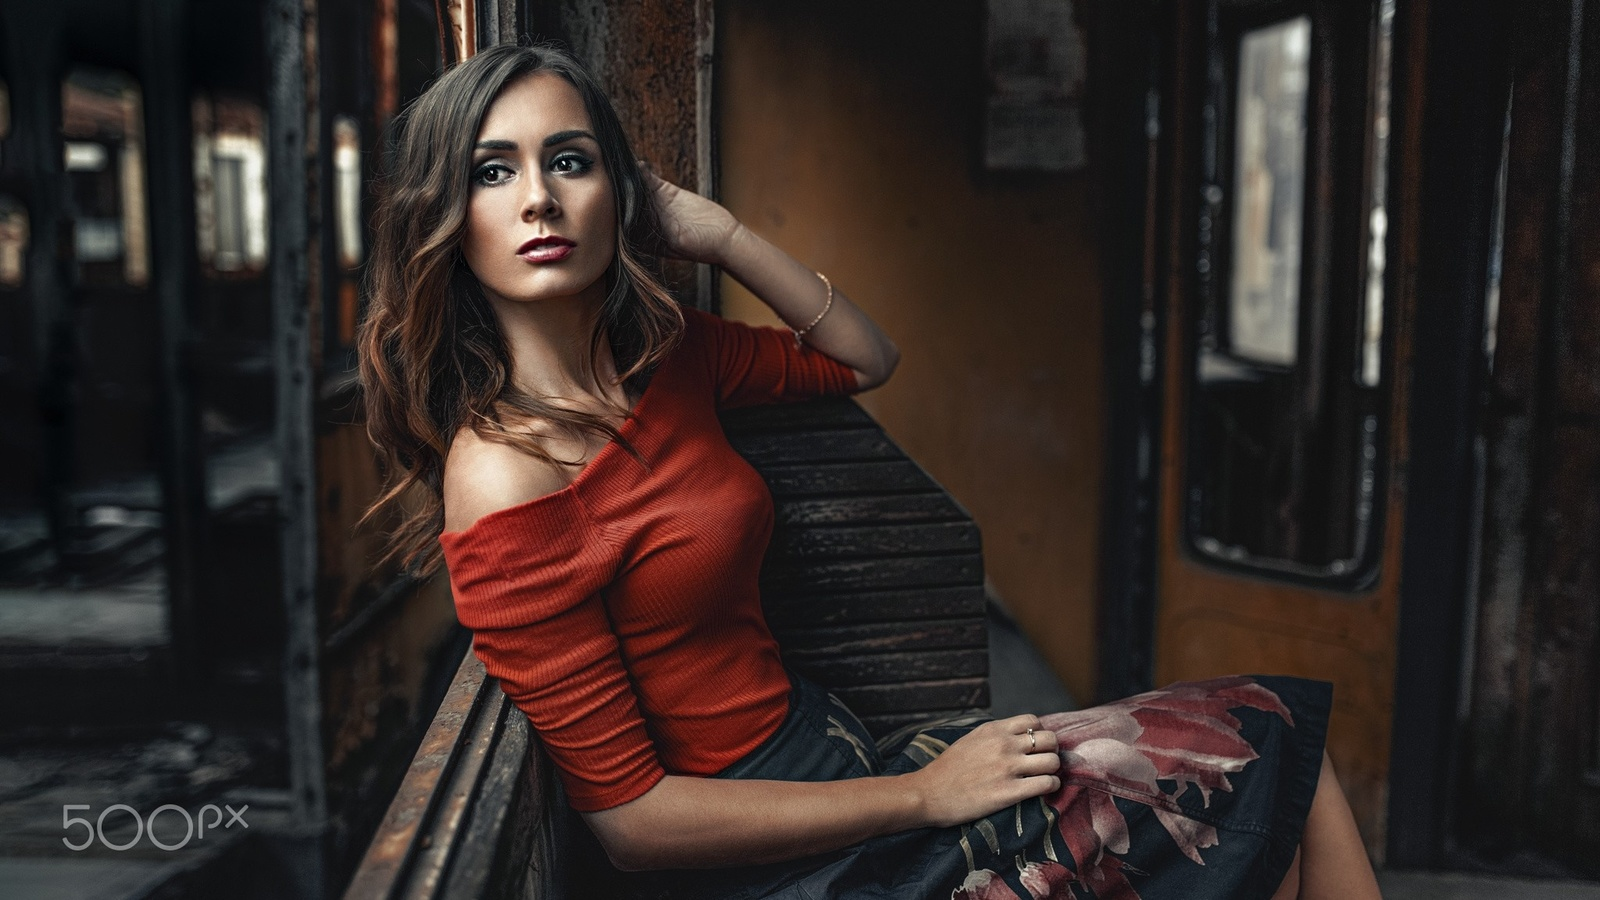 katarzyna kluska, 500px, women, модель, милая, красивая